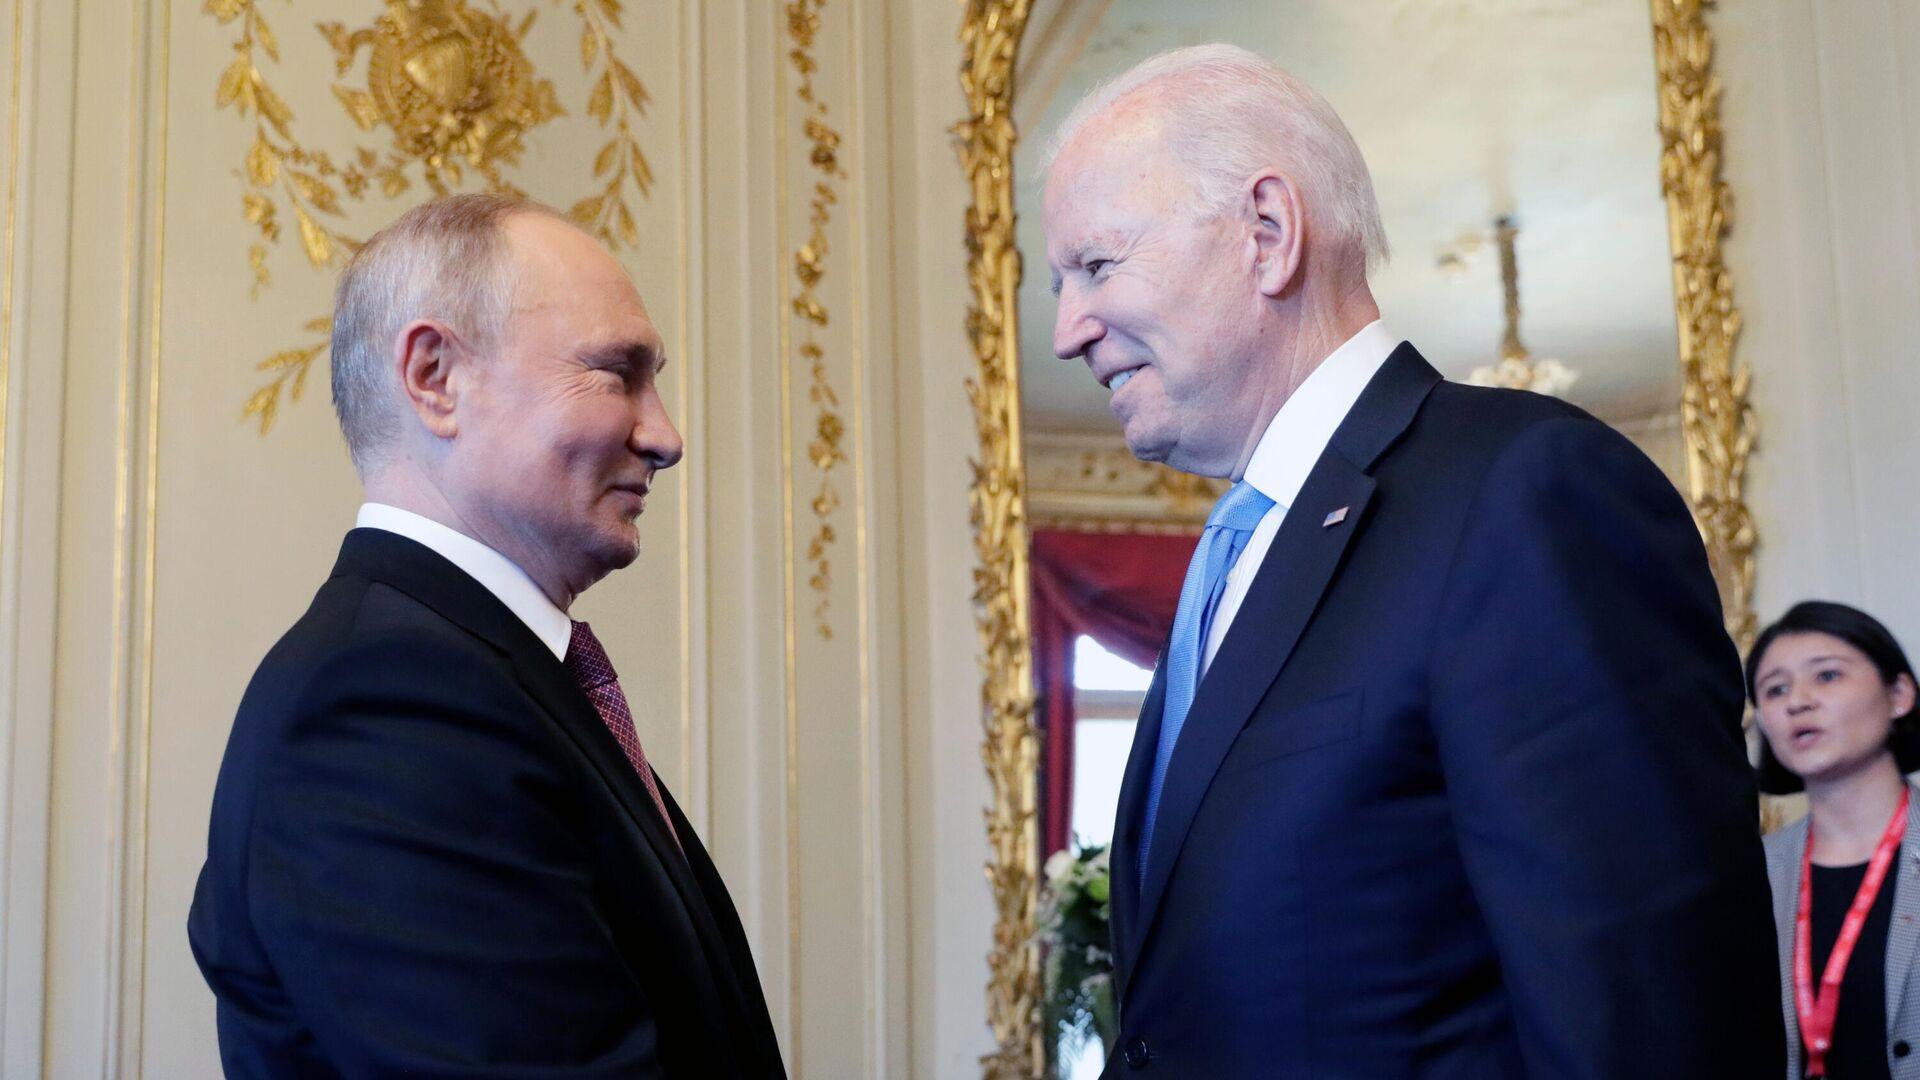 L'incontro bilaterale tra Putin e Biden a Ginevra - Sputnik Italia, 1920, 09.07.2021